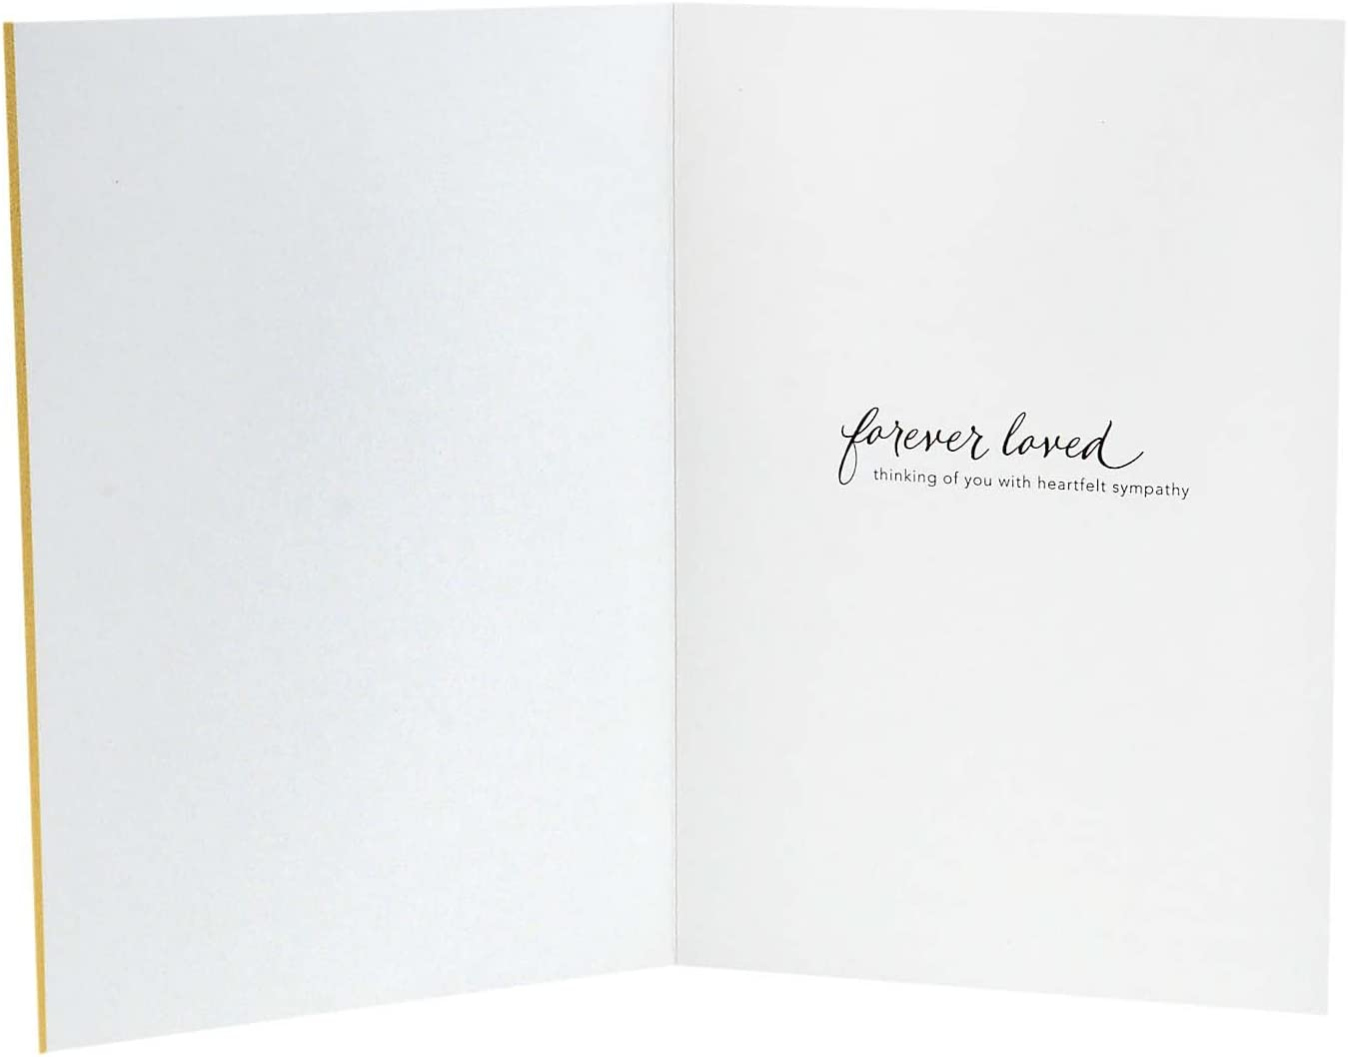 Hallmark Sympathy Cards Assortment Pack 5 Cards, 5 Envelopes 1995RZC1910